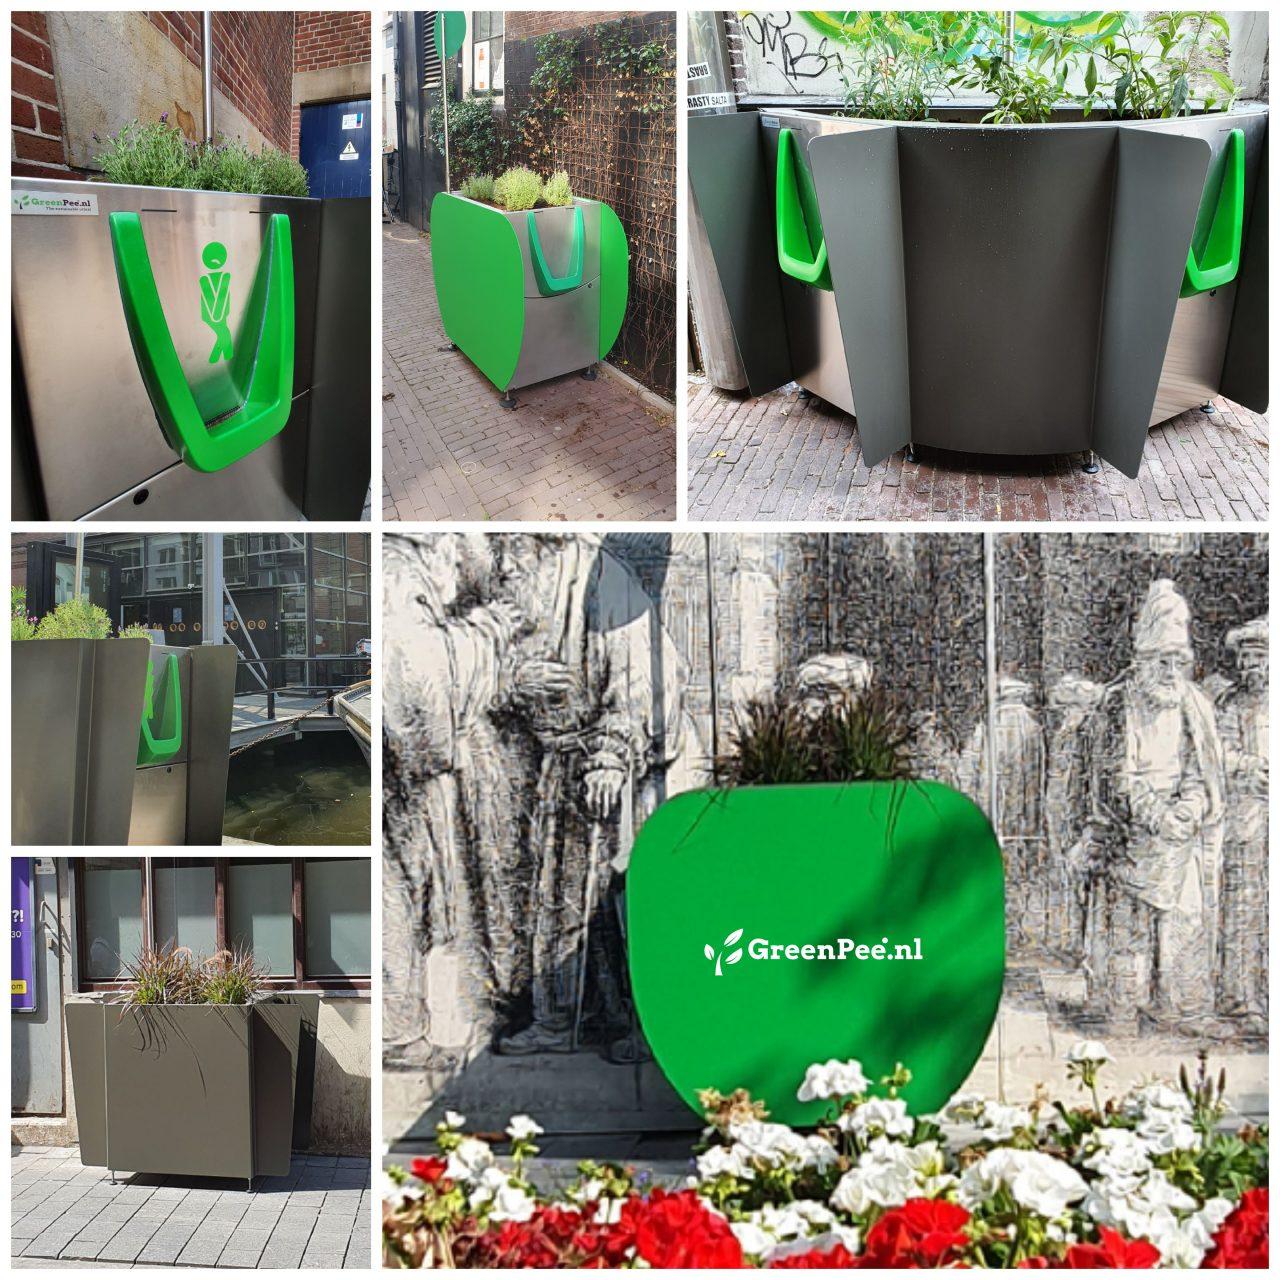 https://greenpee.nl/wp-content/uploads/2020/08/collage-GP-Amsterdam-1280x1280.jpg